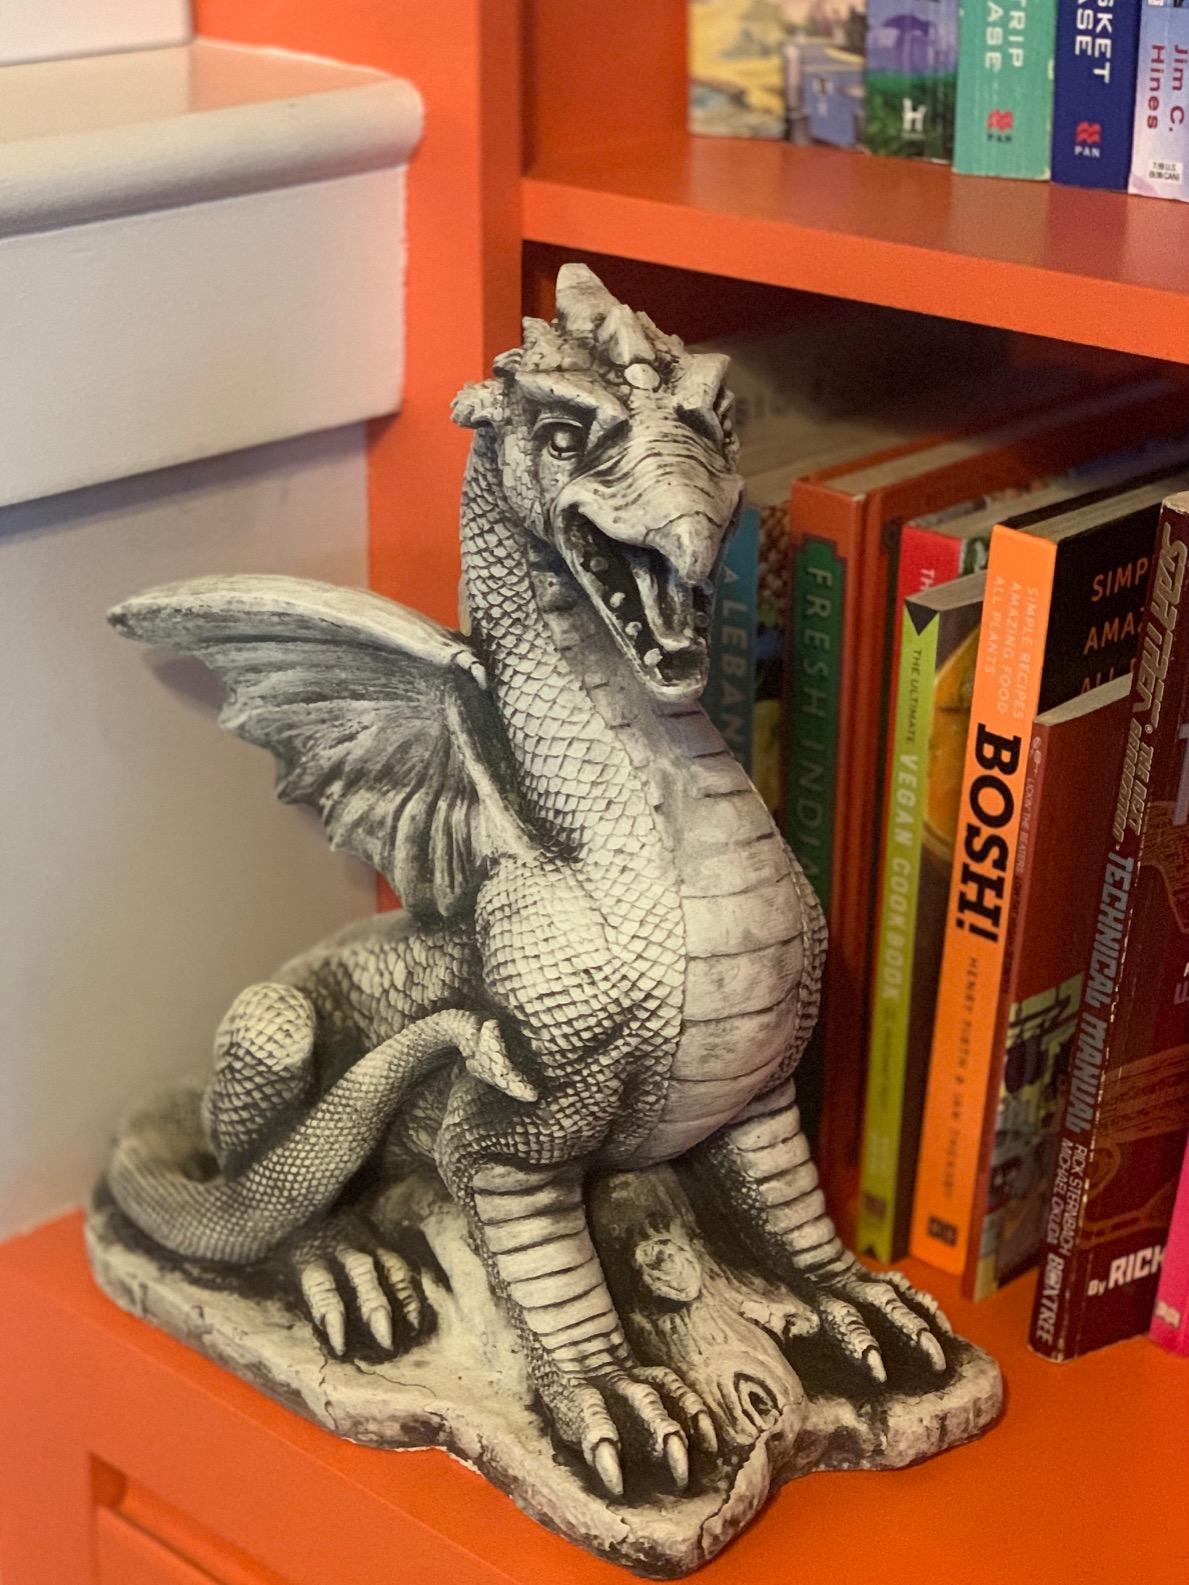 Stone dragon on a bookshelf